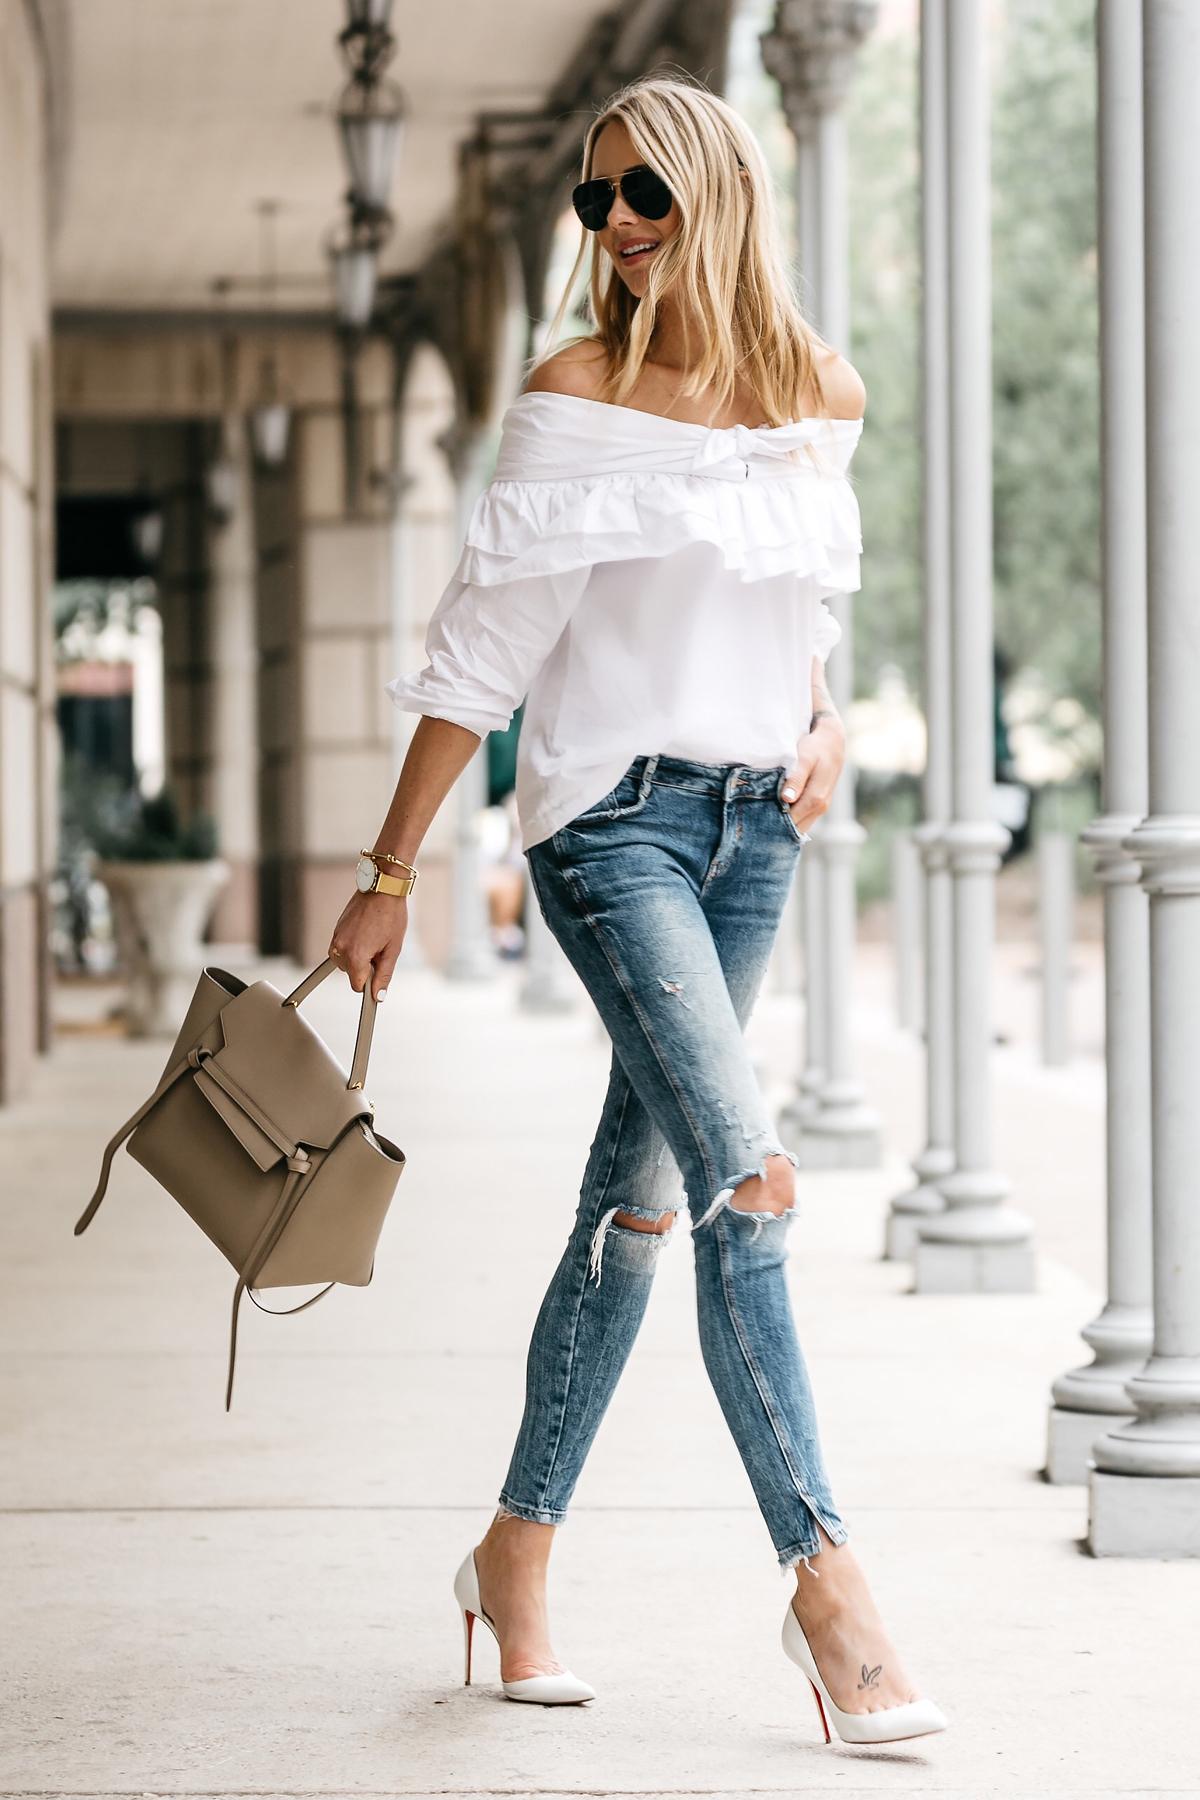 Fashion Jackson, Dallas Blogger, Fashion Blogger, Street Style, White Off-the-Shoulder Bow Ruffle Top, Zara Ripped Skinny Jeans, Christian Louboutin Iriza dOrsay White Pumps, Celine Belt Handbag